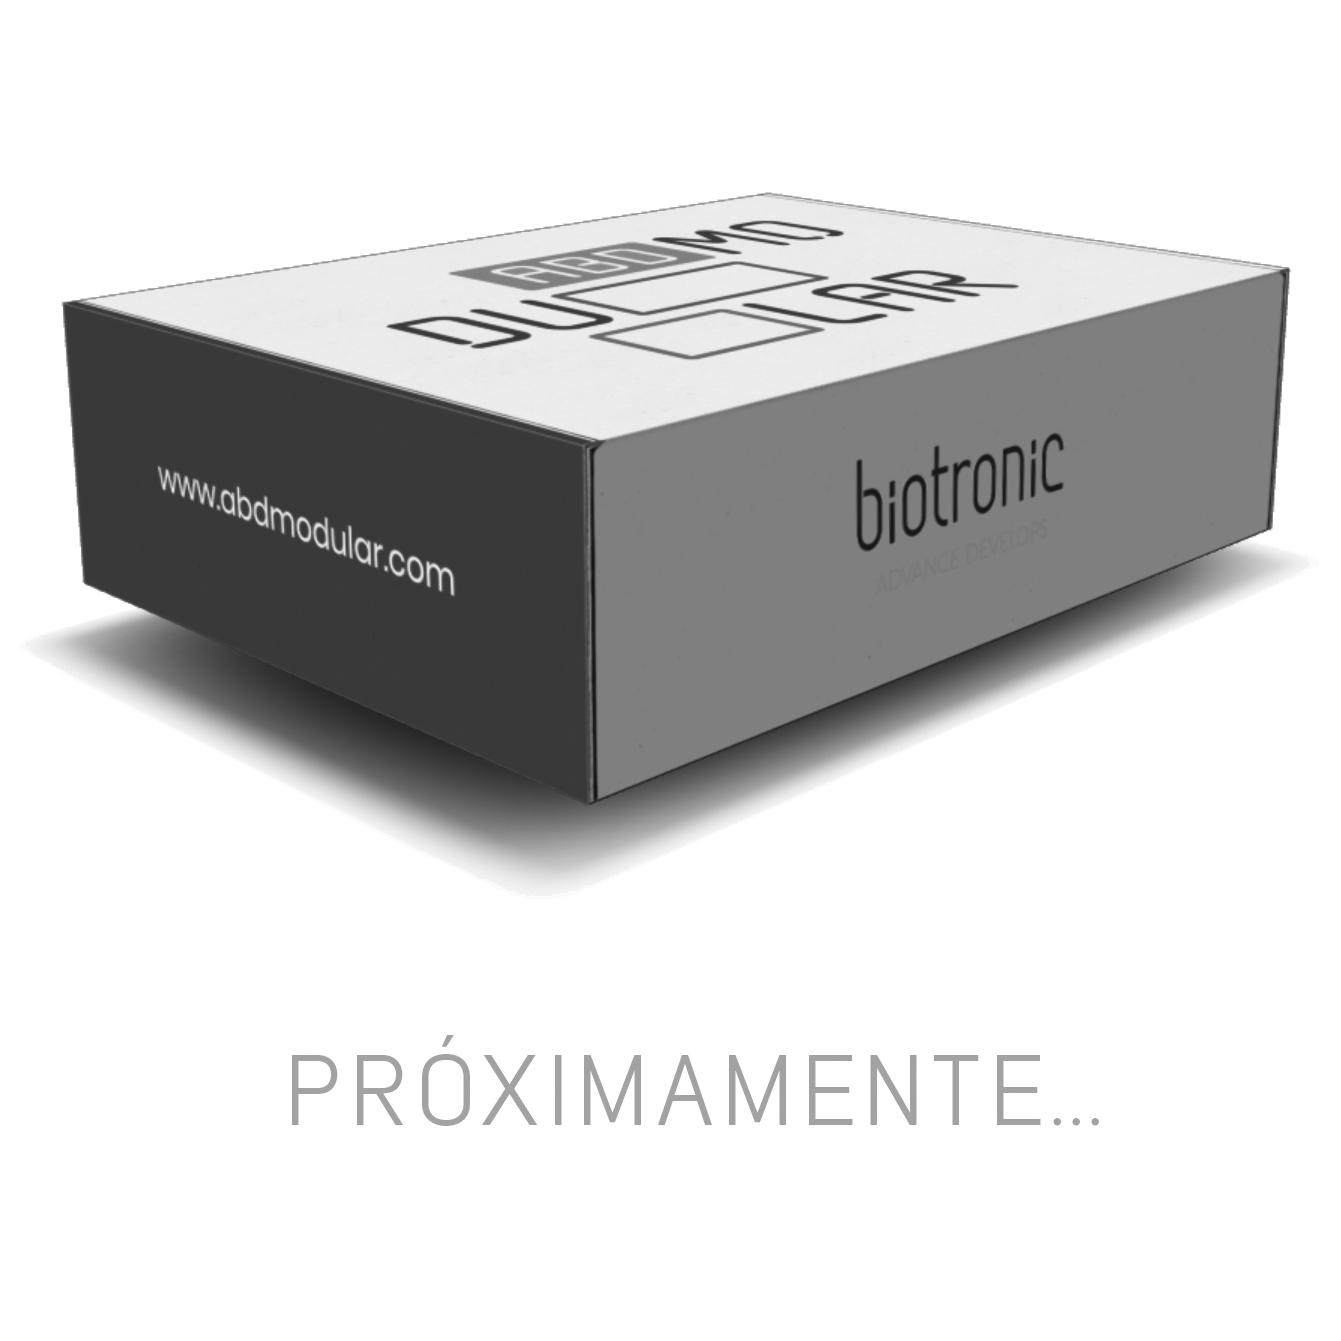 Caja-Proximamente